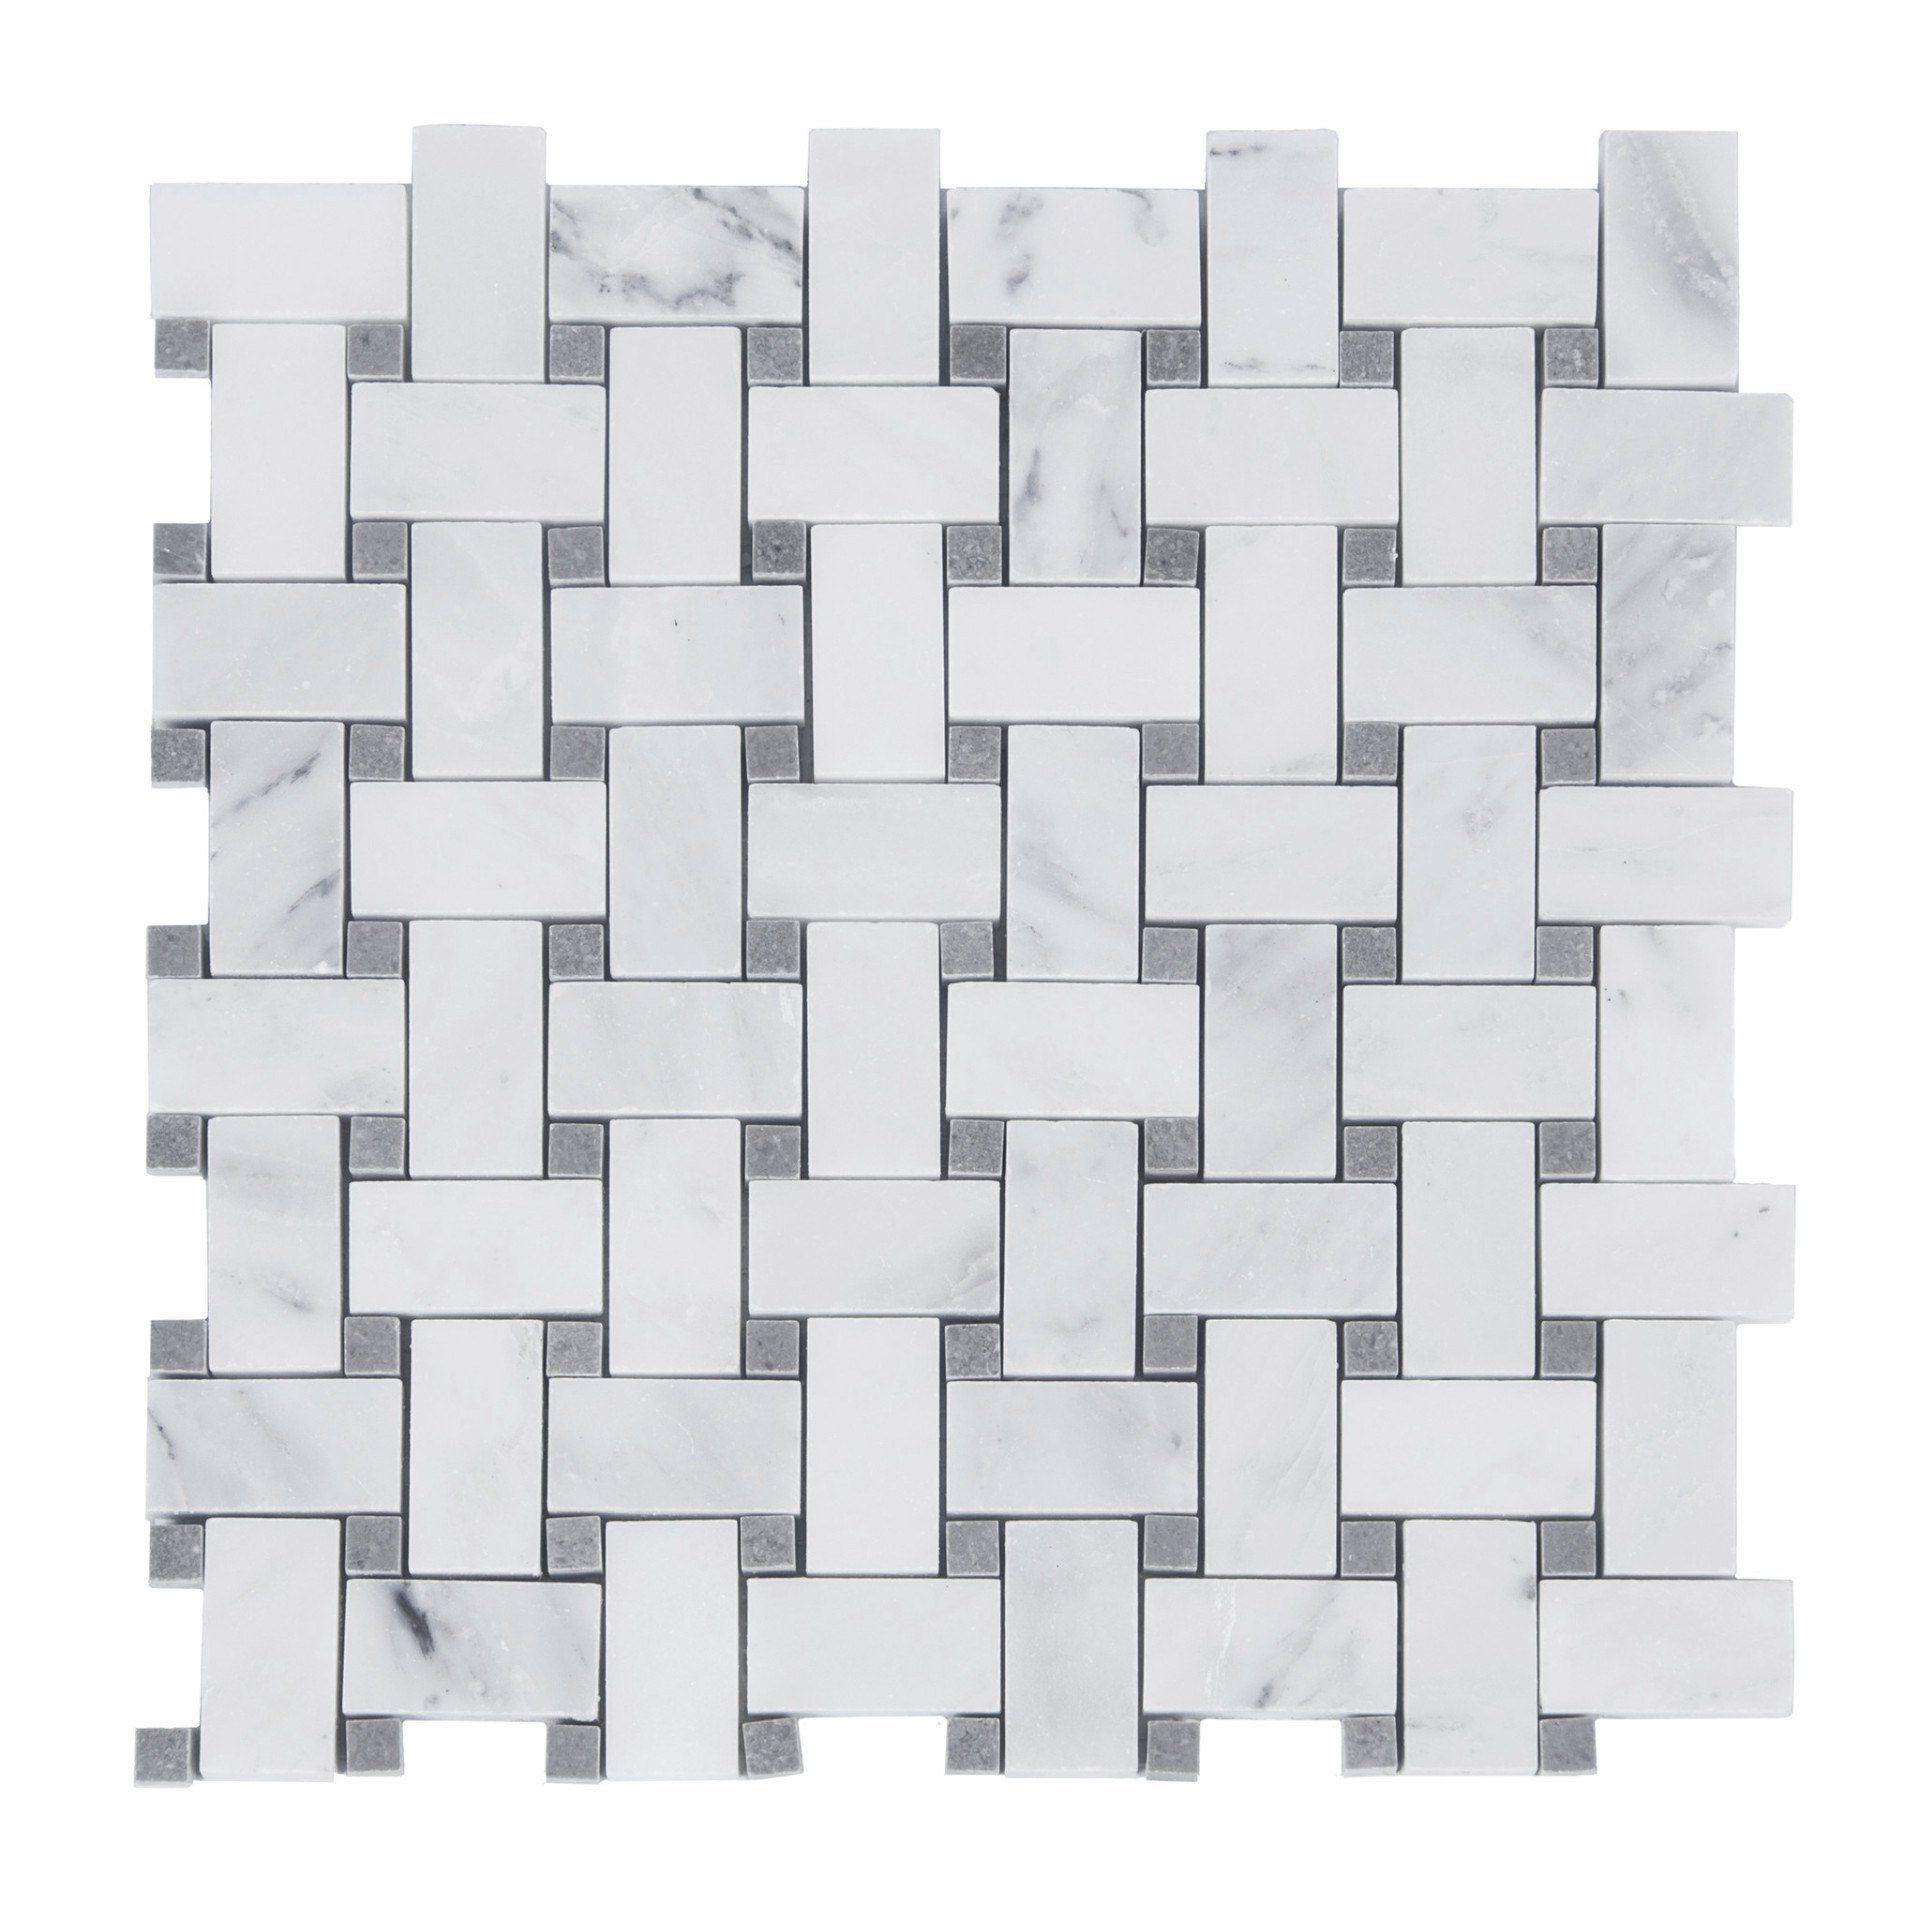 Carrara Carrera Lady Marble Accent Basketweave Mosaic Polished Basket Weave Tile Stone Mosaic Basket Weaving